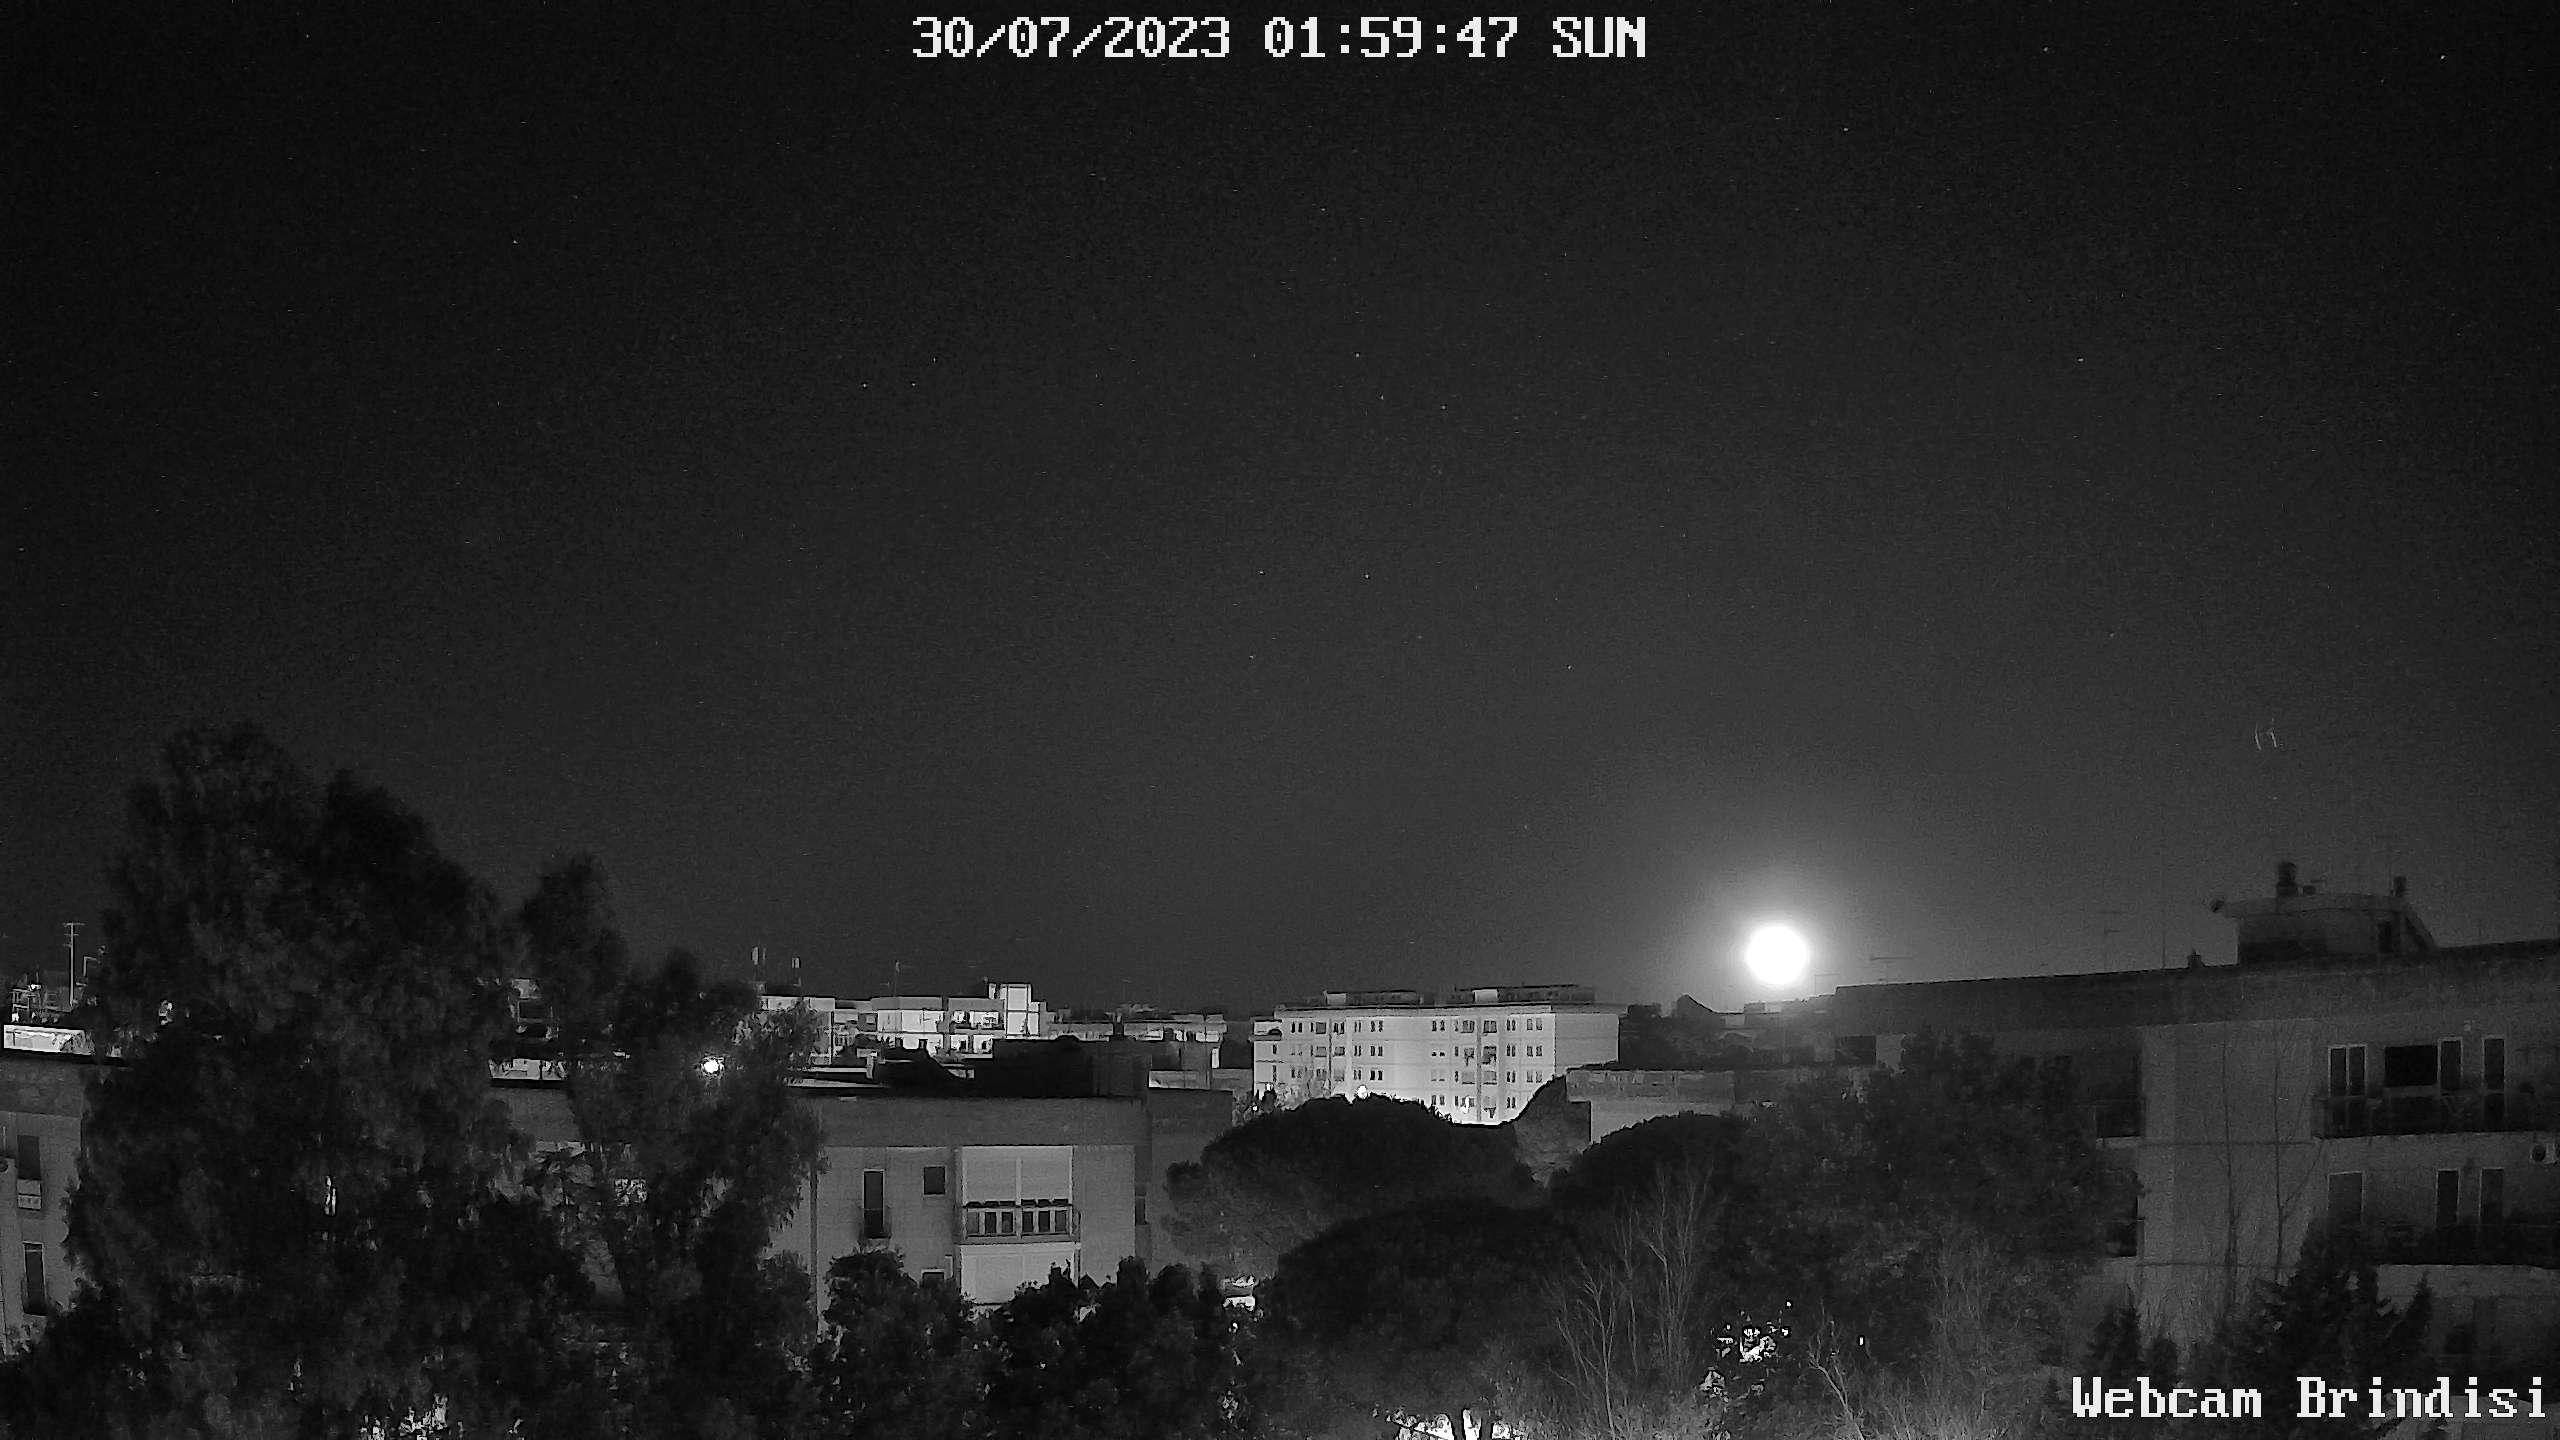 Webcam Brindisi - Stazione Meteo Brindisi S. Elia